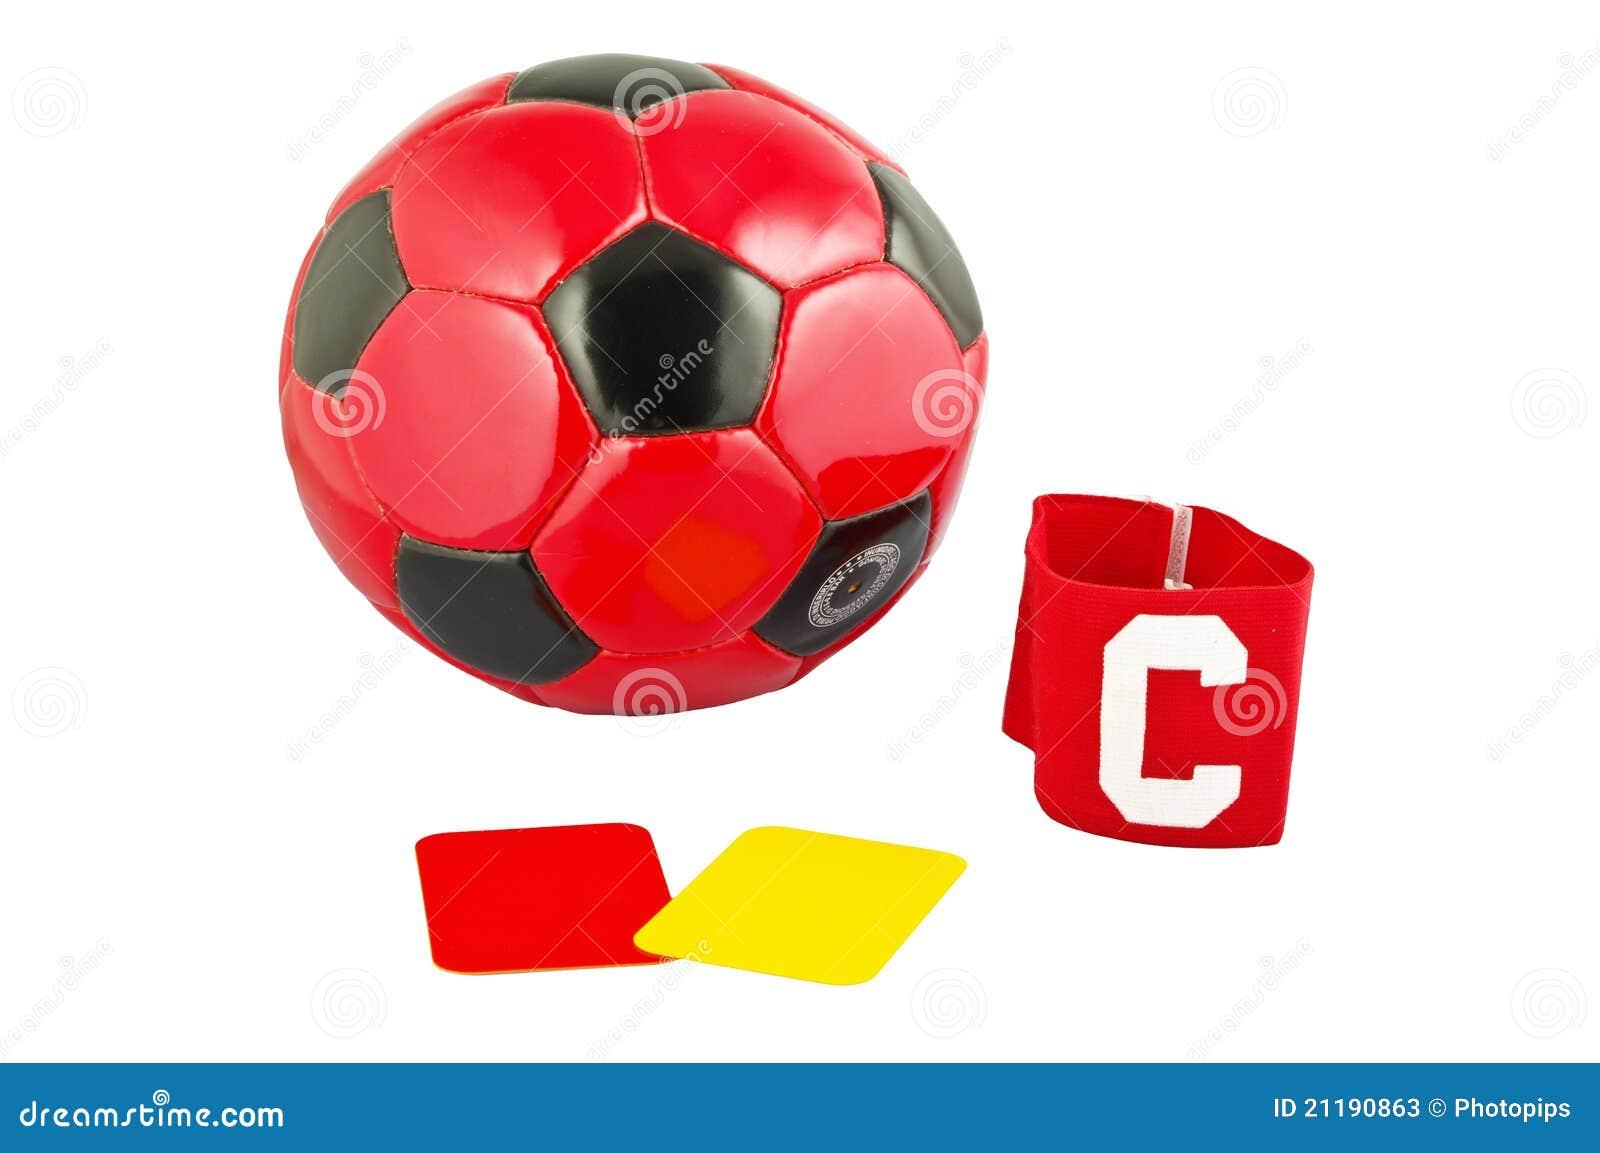 Accessory soccer